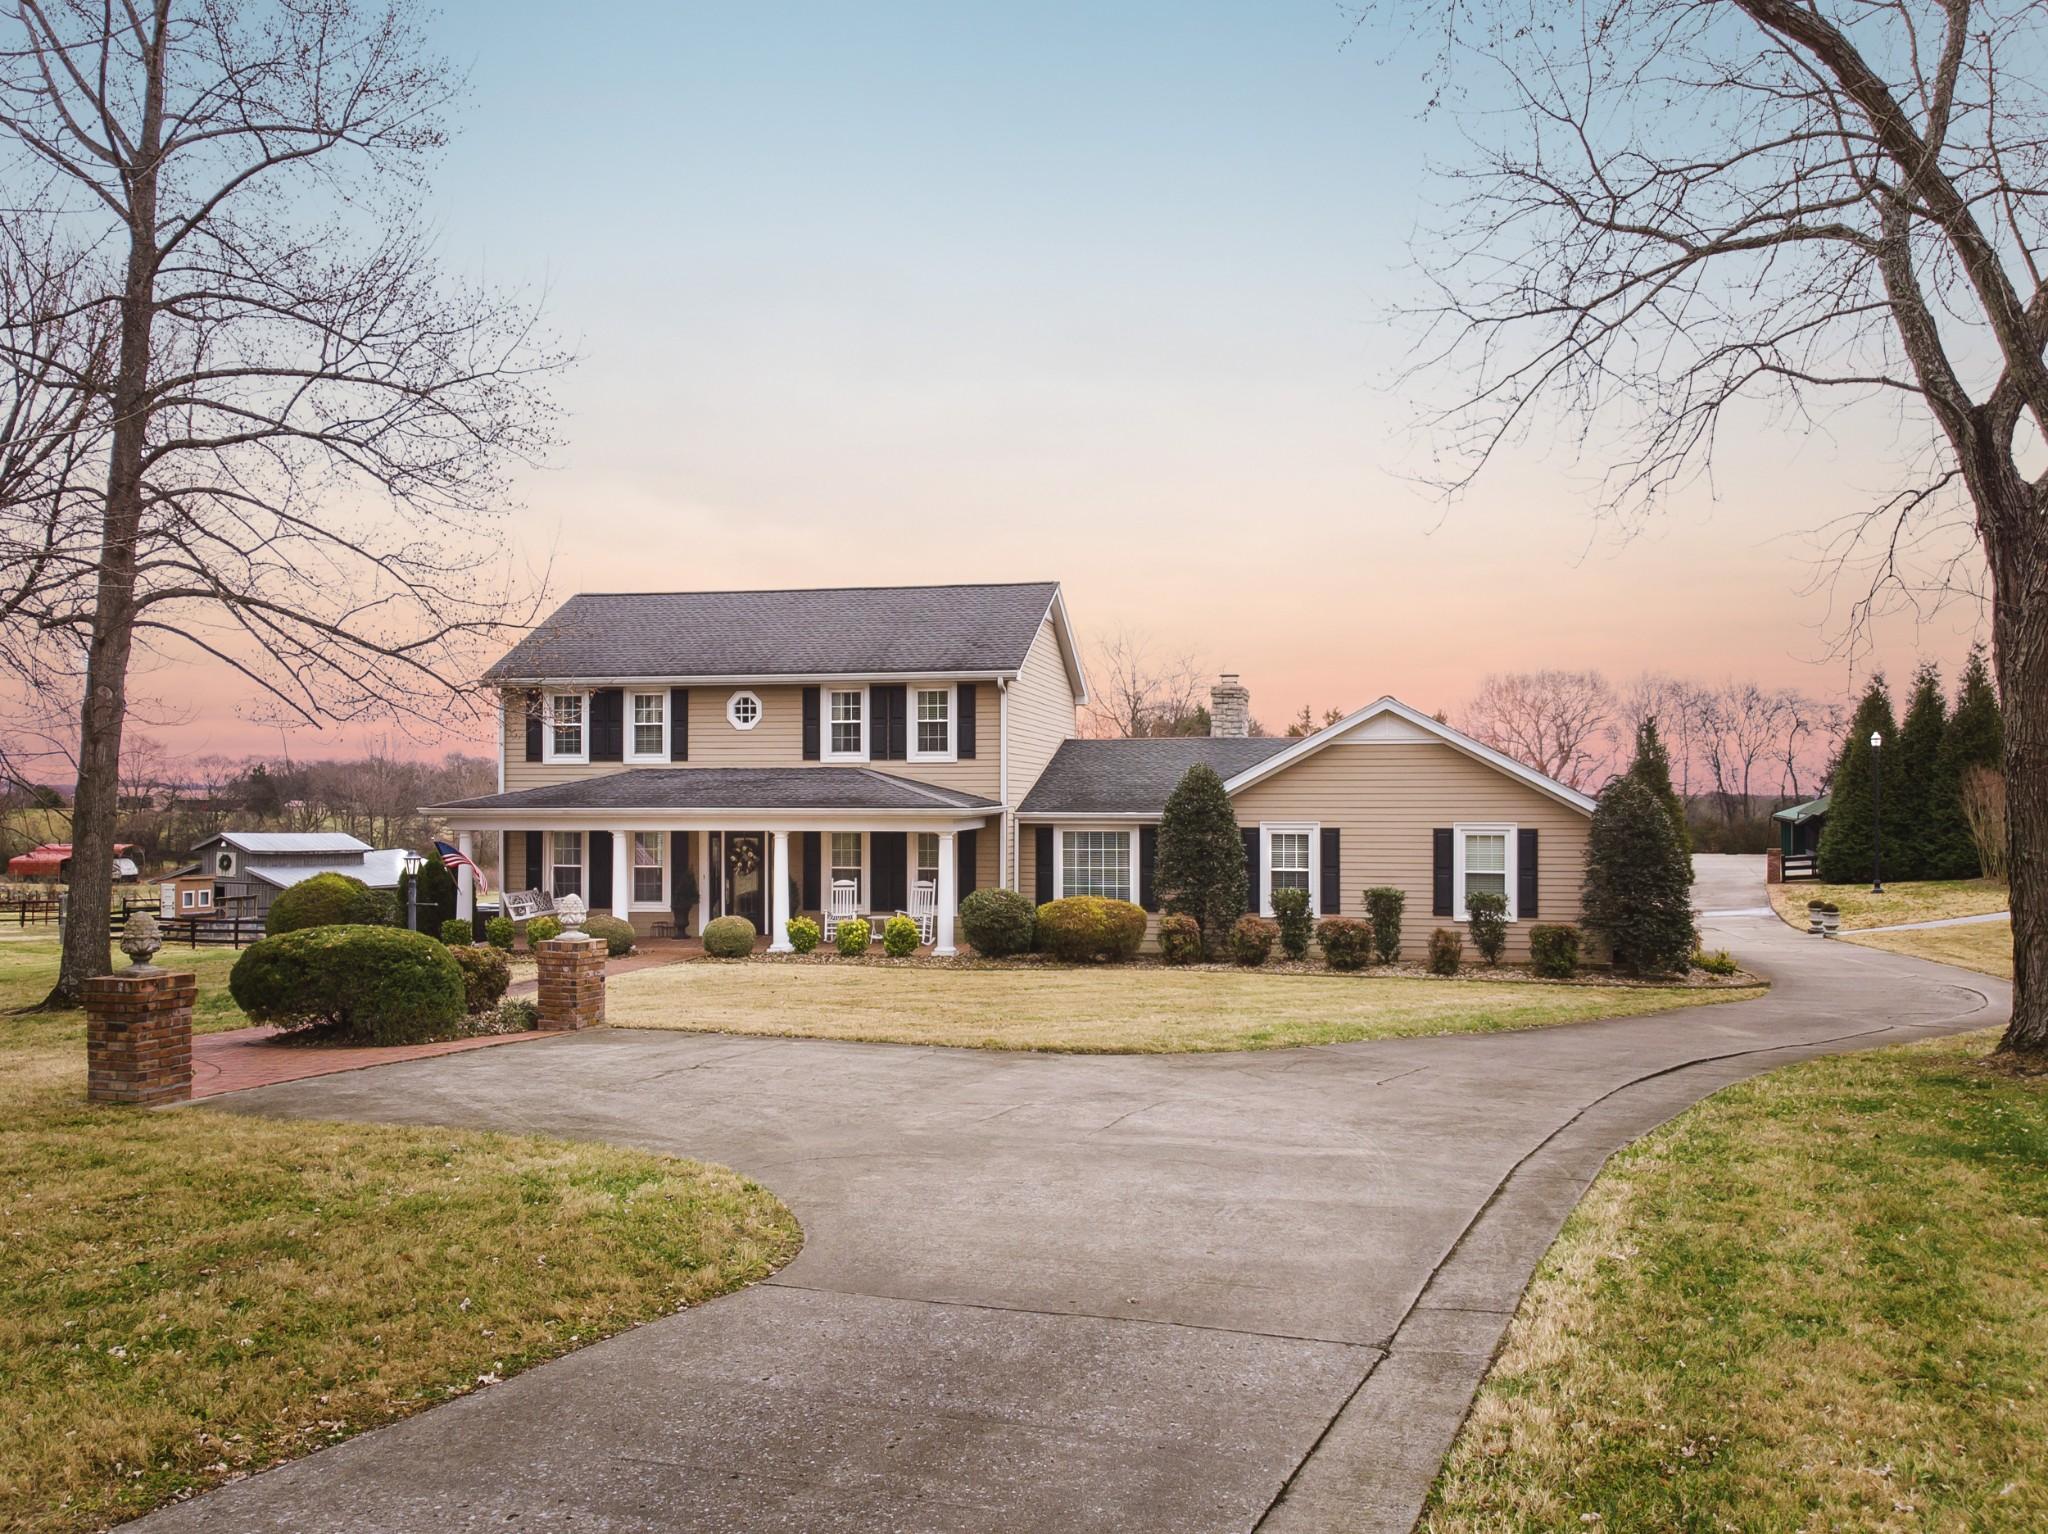 1037 N Sugartree Ln, Gallatin, TN 37066 - Gallatin, TN real estate listing